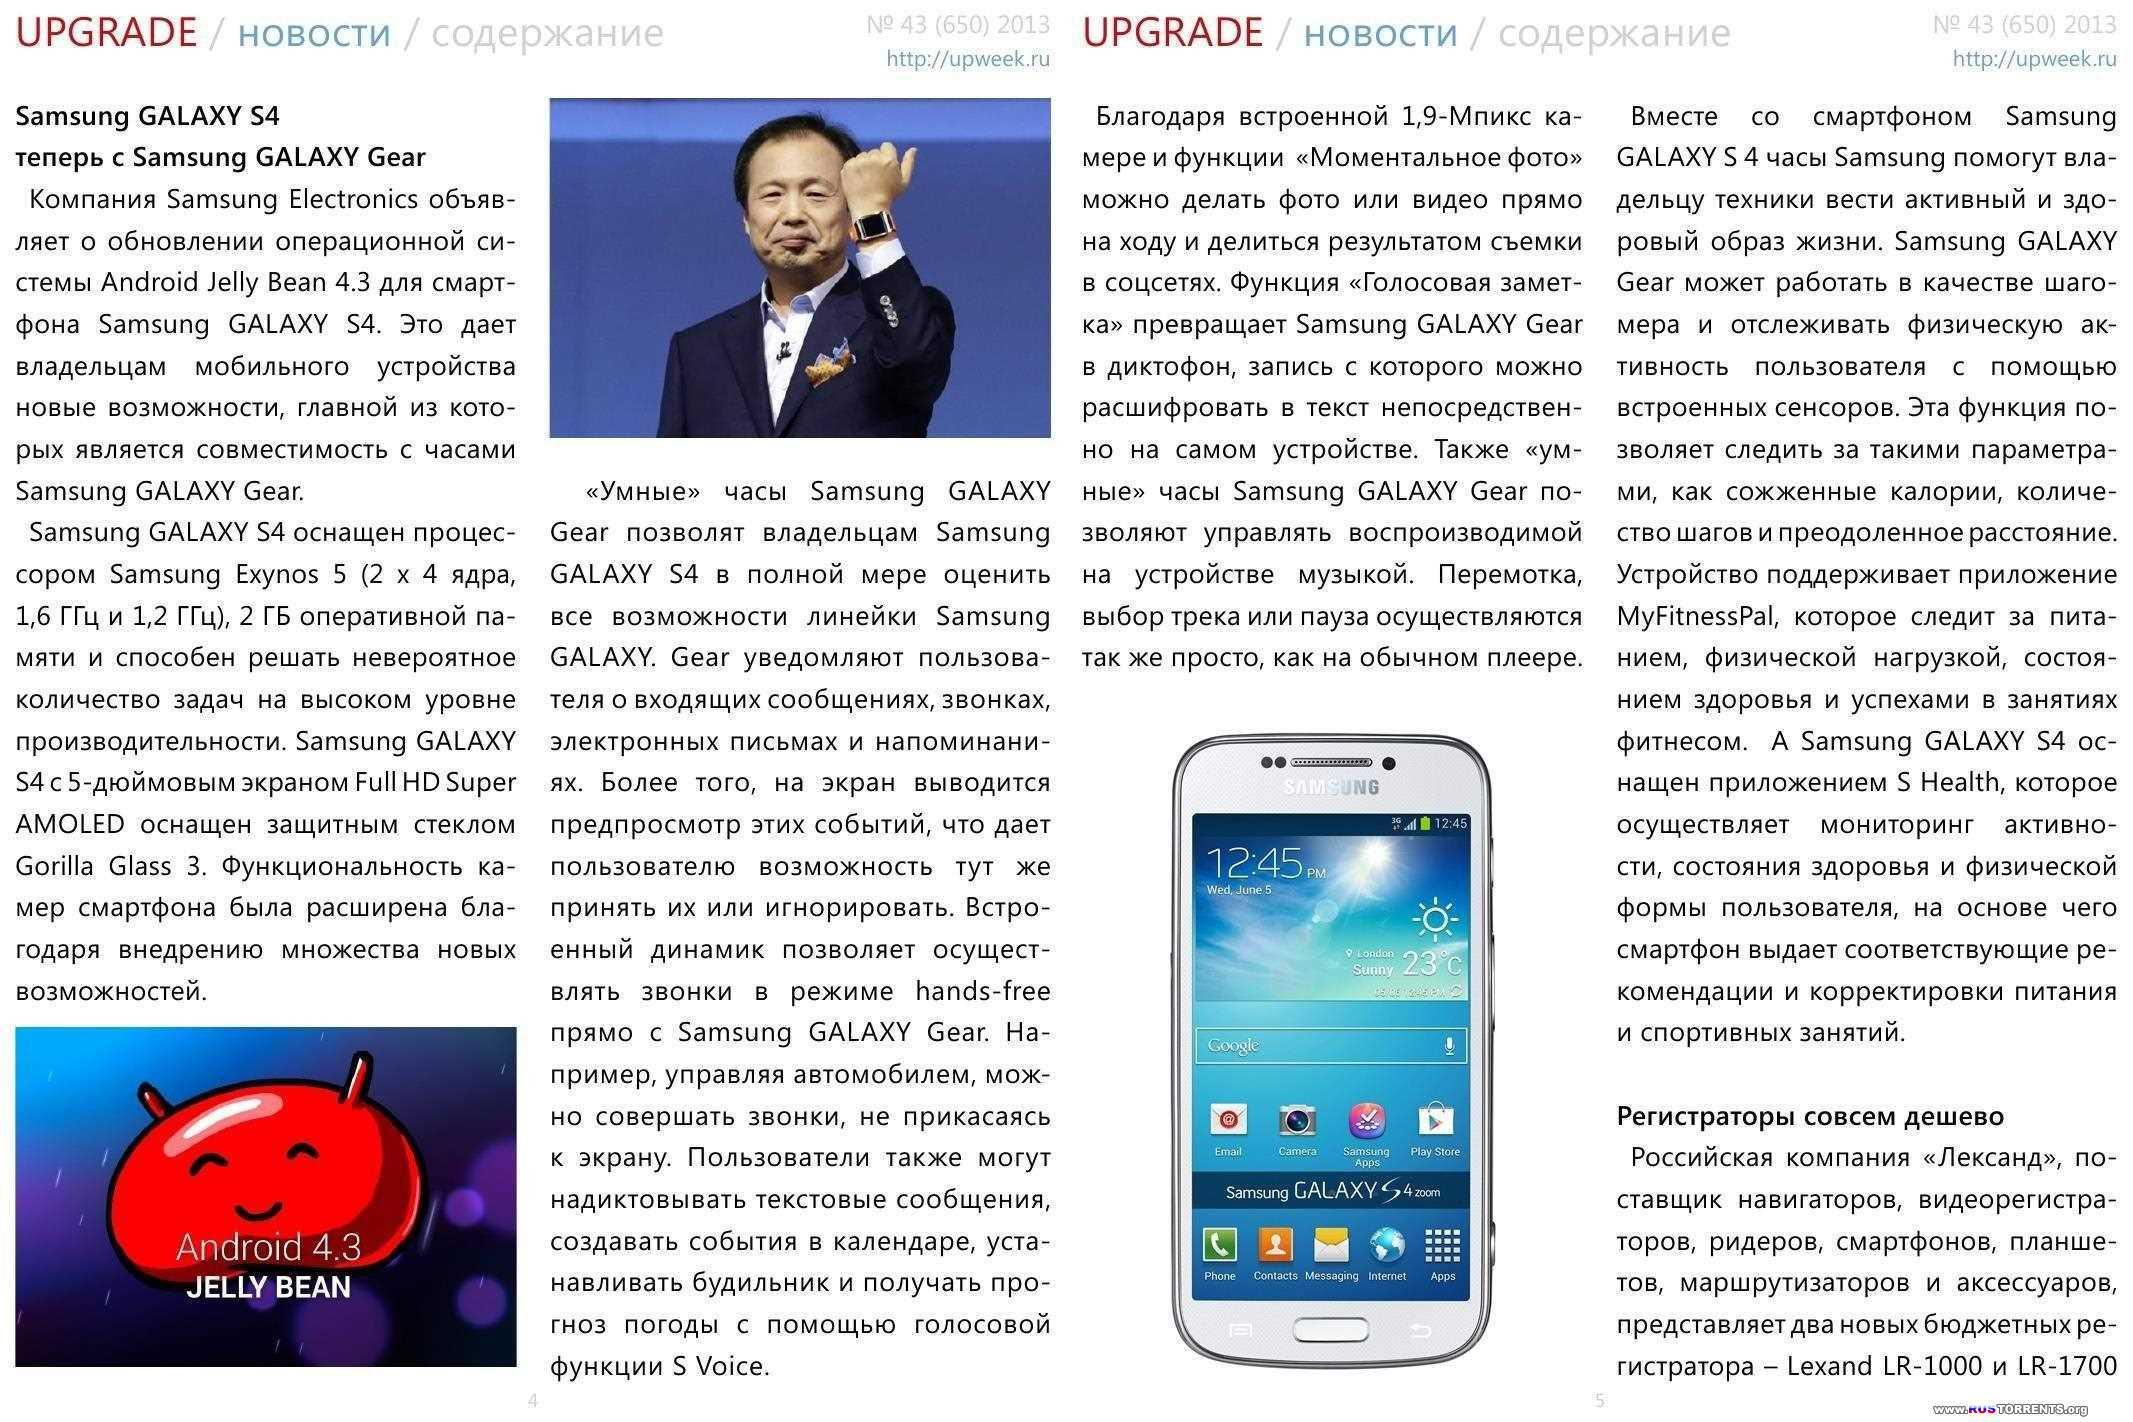 Upgrade [122 номера] | PDF